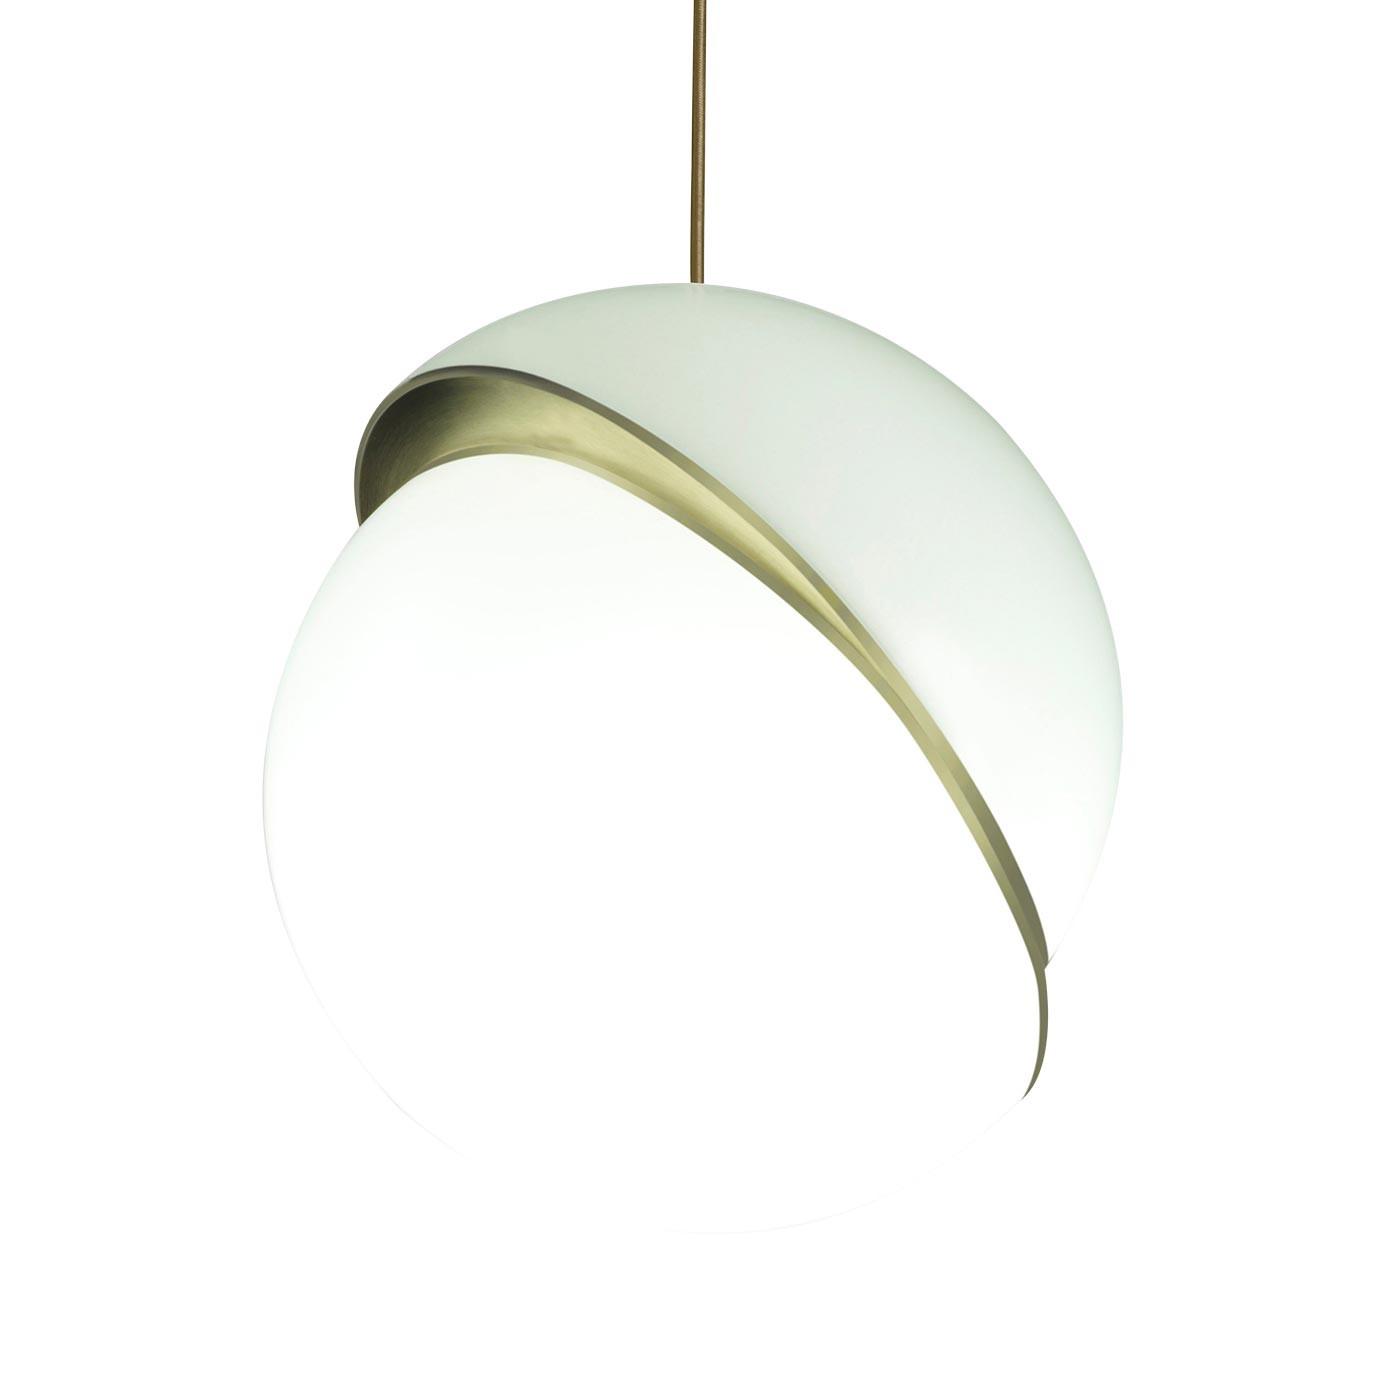 Lee Broom Crescent Light Pendant At Nostraforma